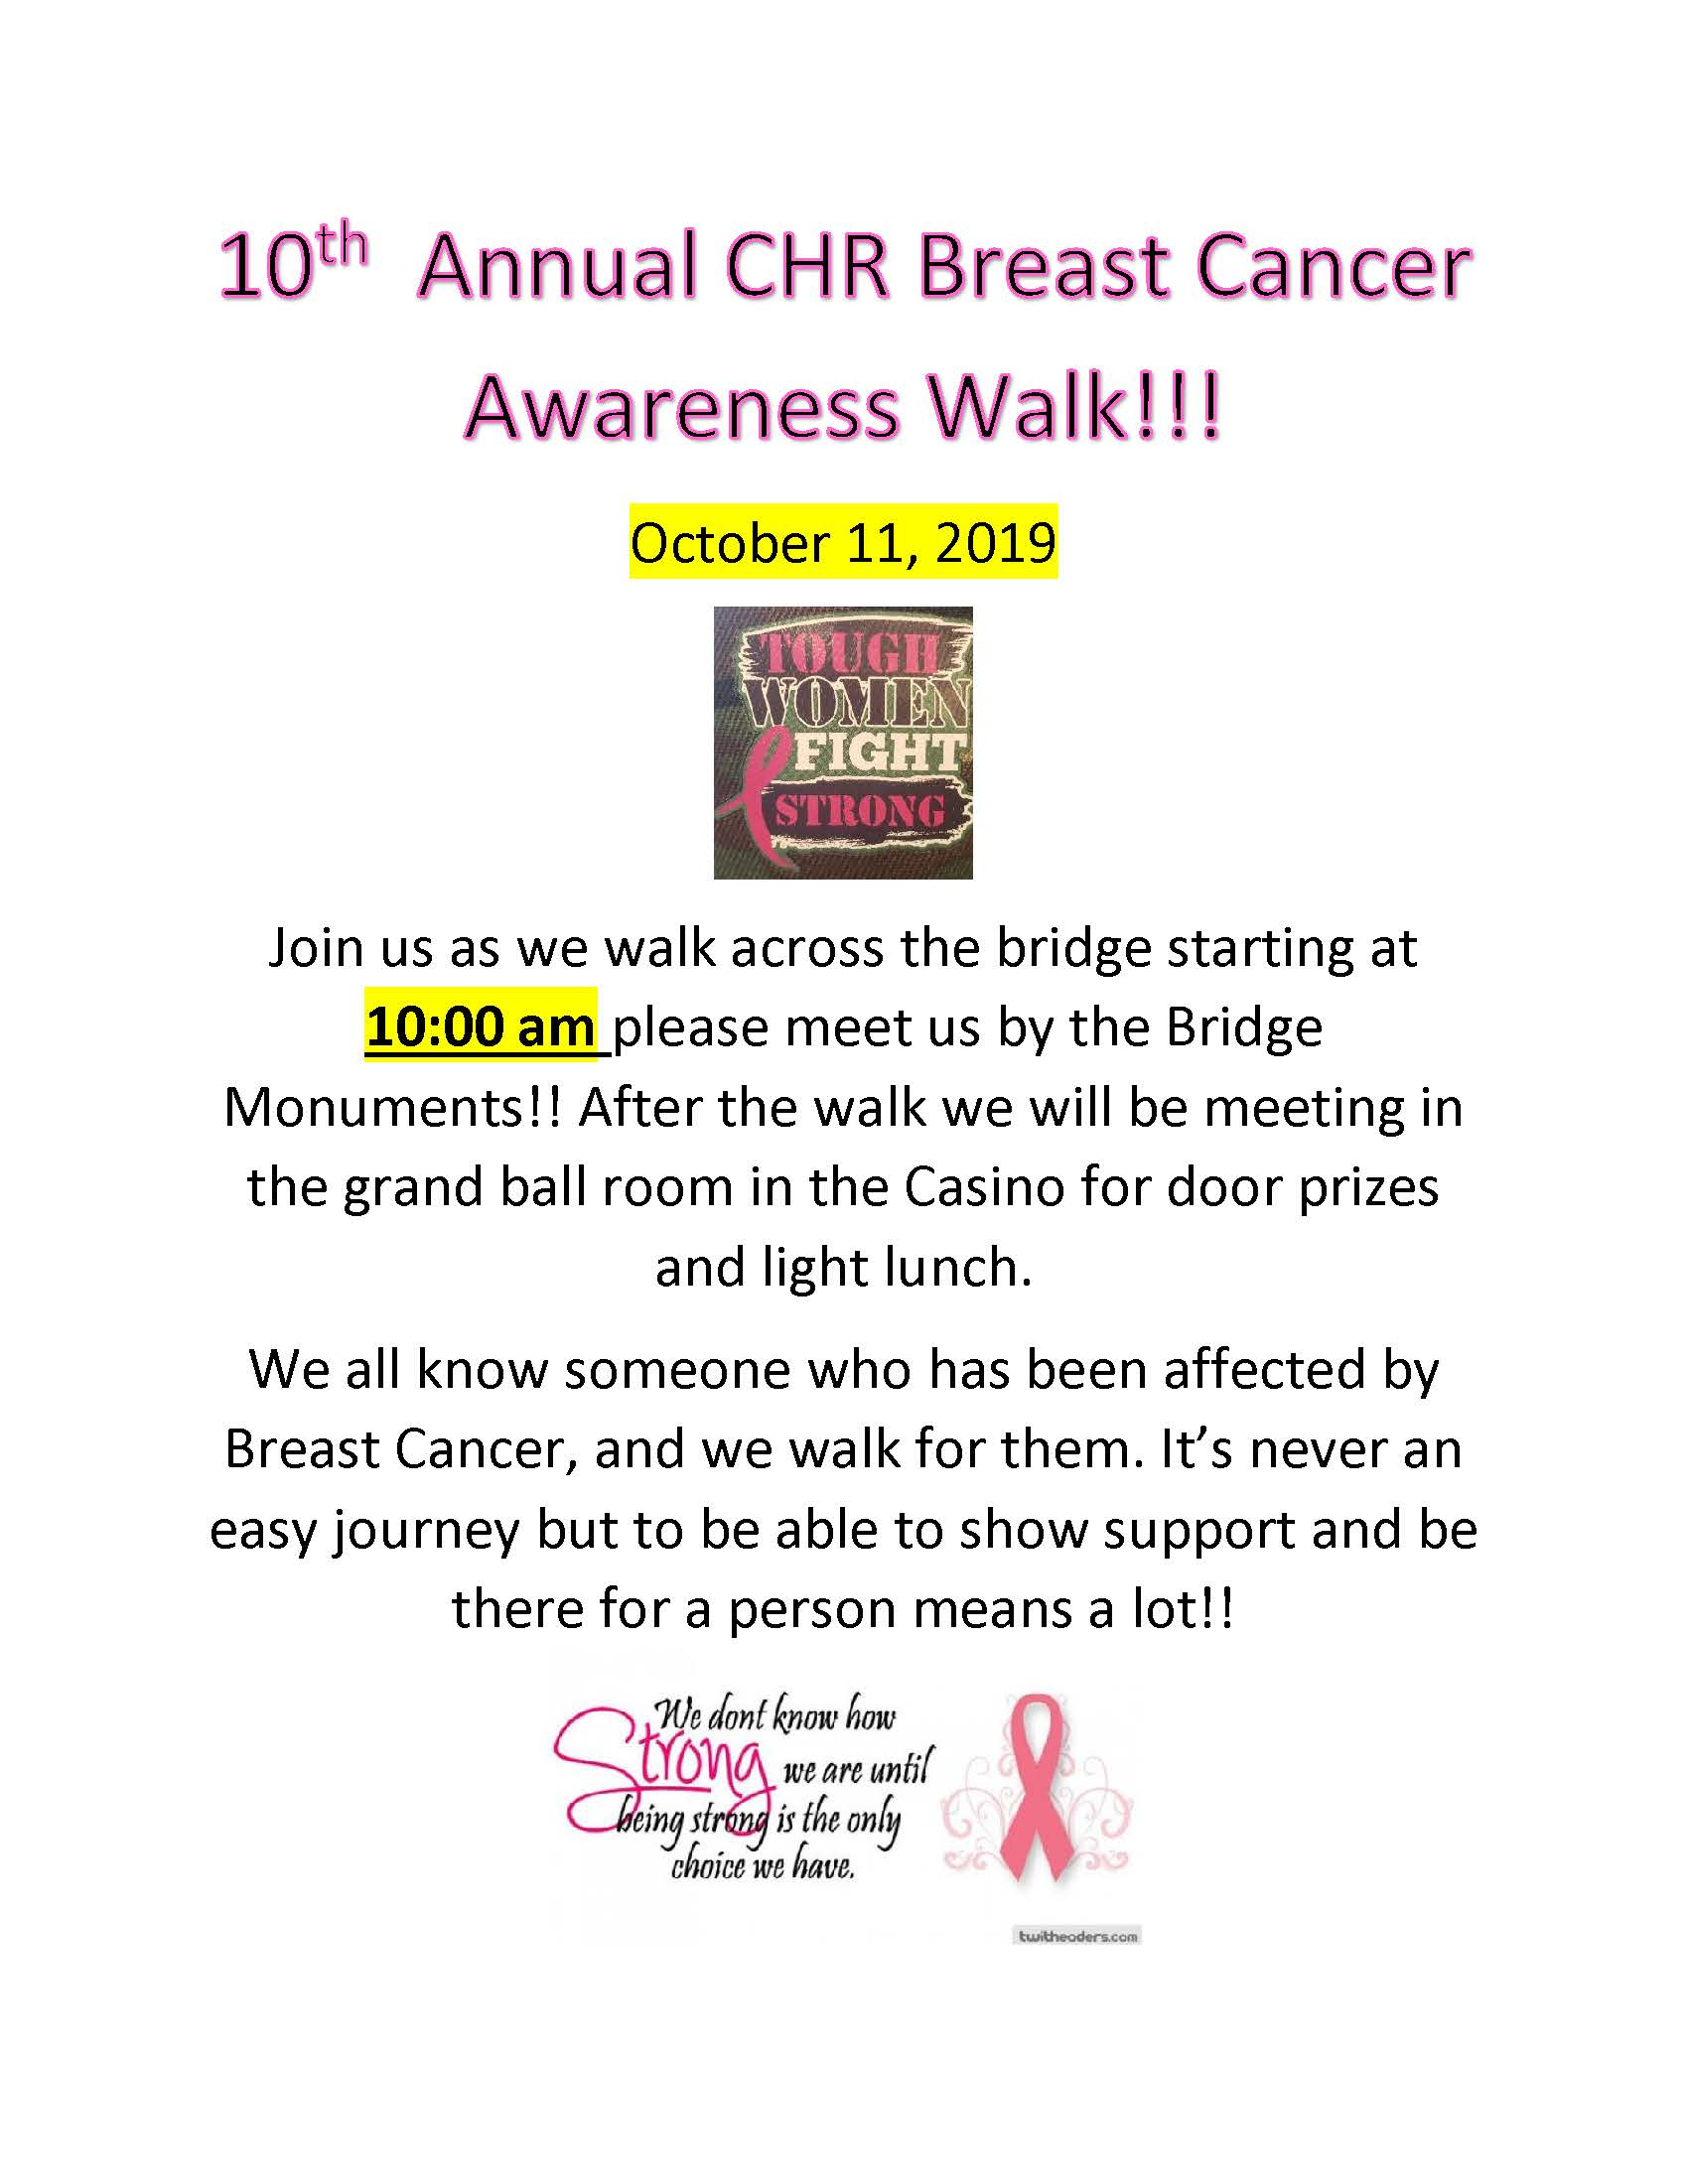 10 th  Annual CHR Breast Cancer Awareness Walk.jpg